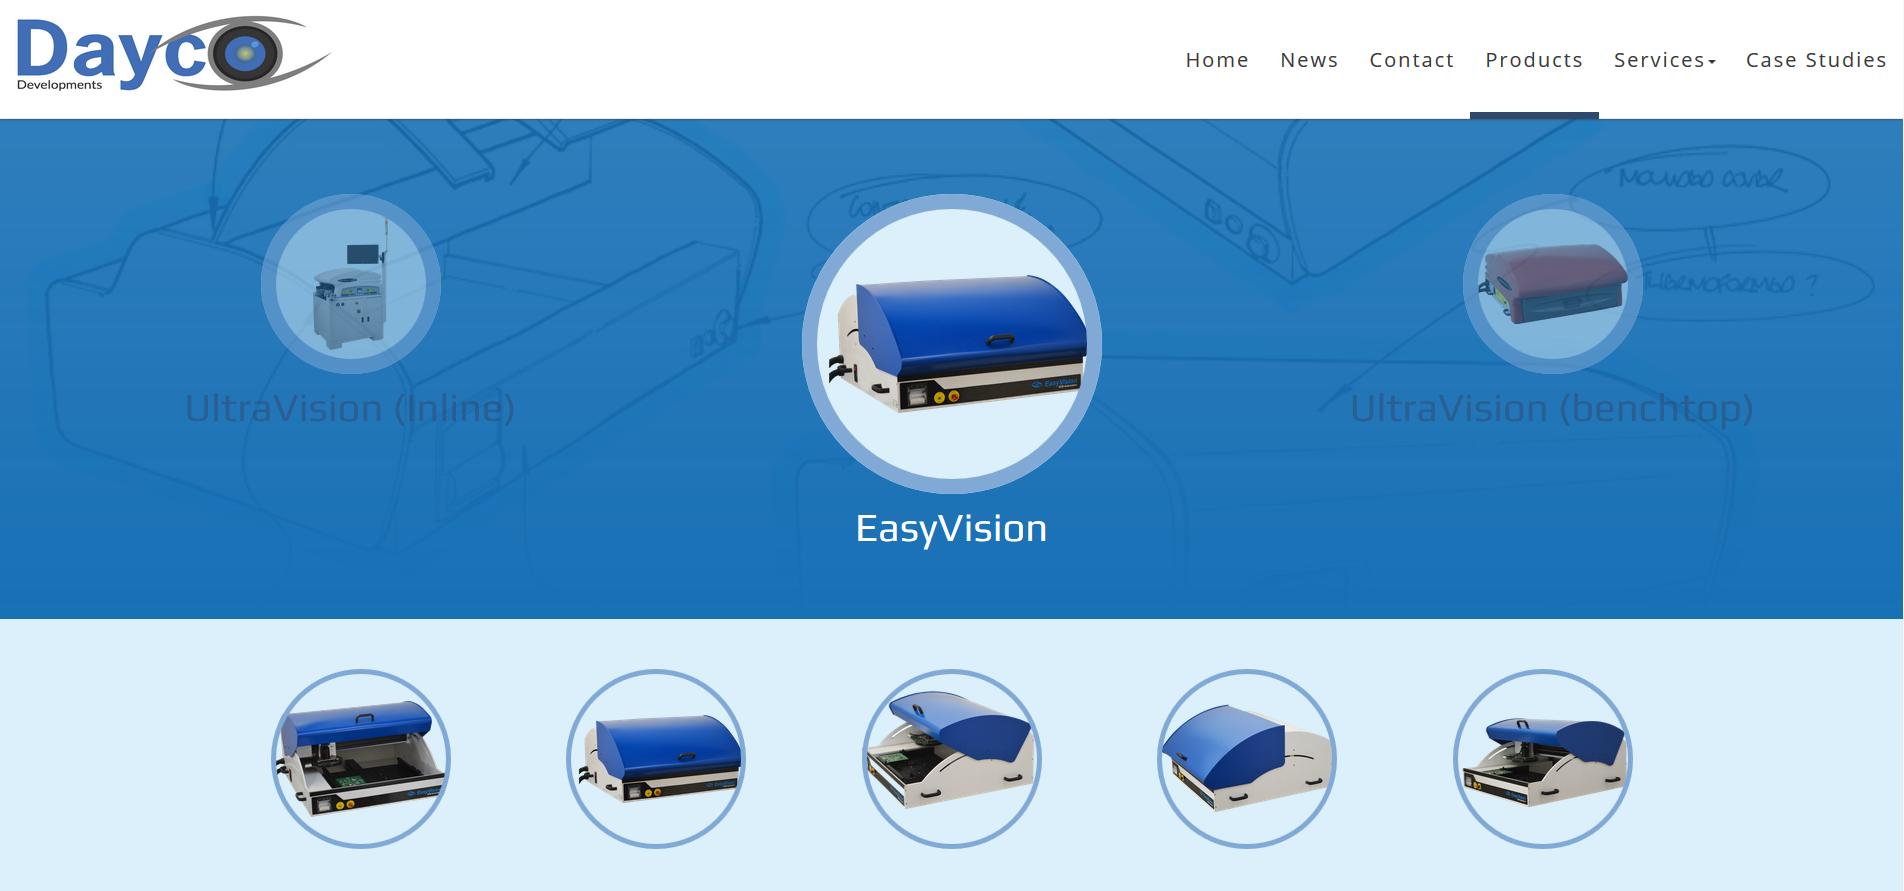 UltraVision, EasyVision, UltraVision Inline